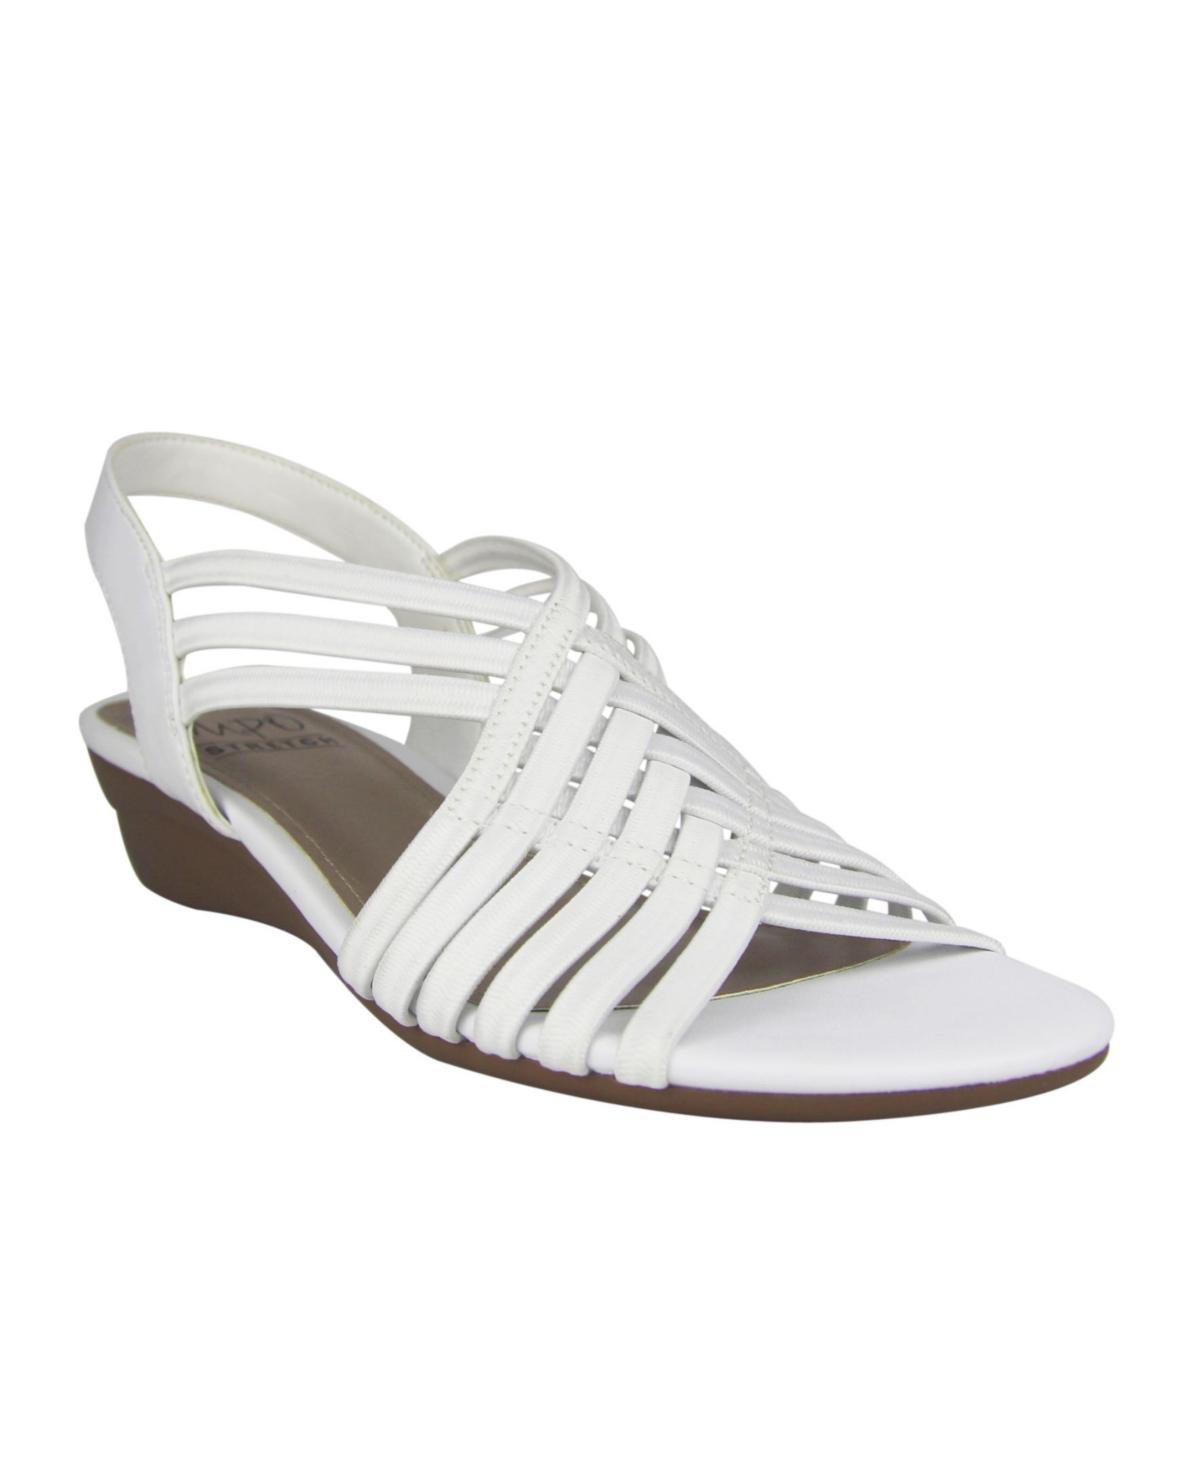 Impo Women's Rassida Stretch Wedge Sandal Women's Shoes